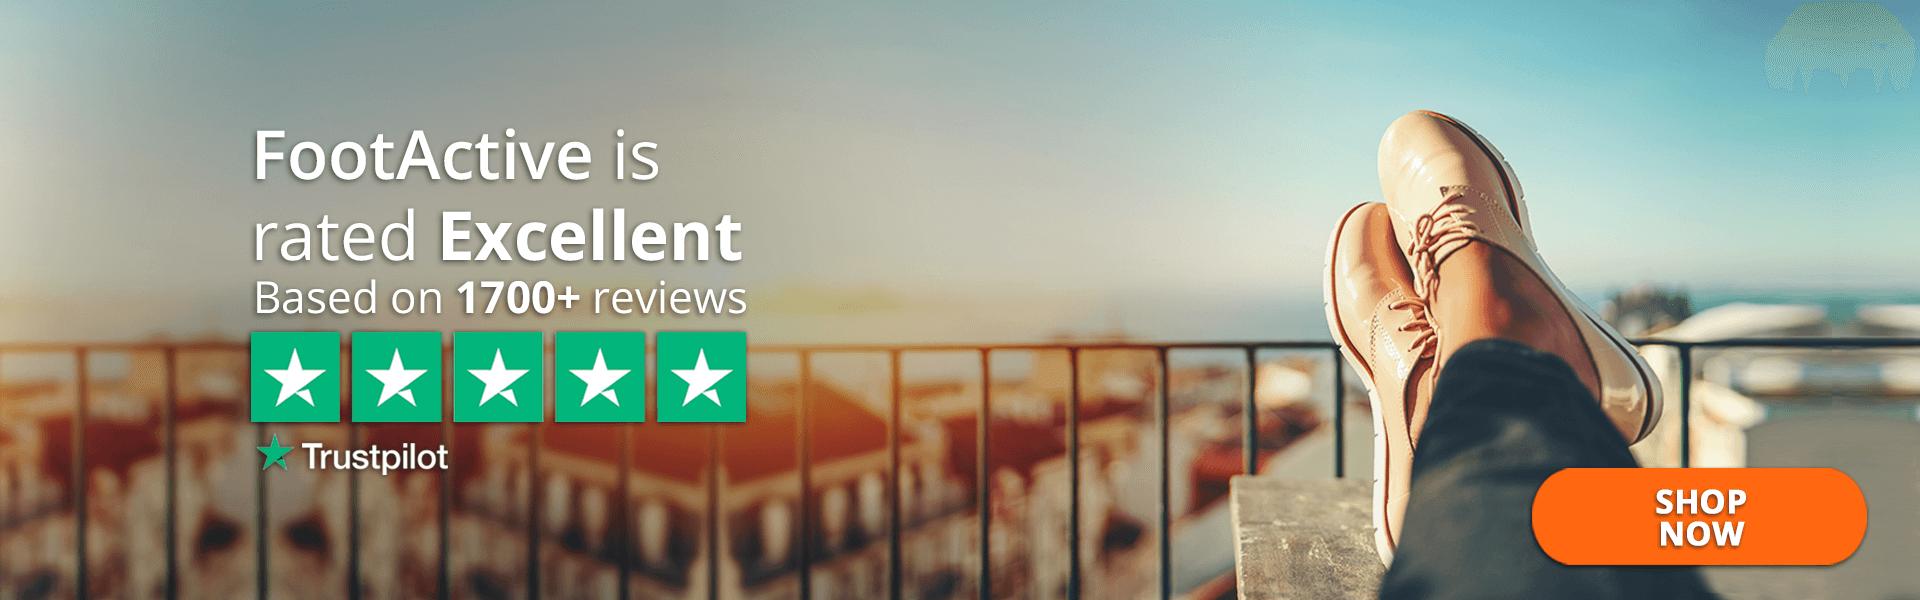 FootActive Trustpilot Rating 5*